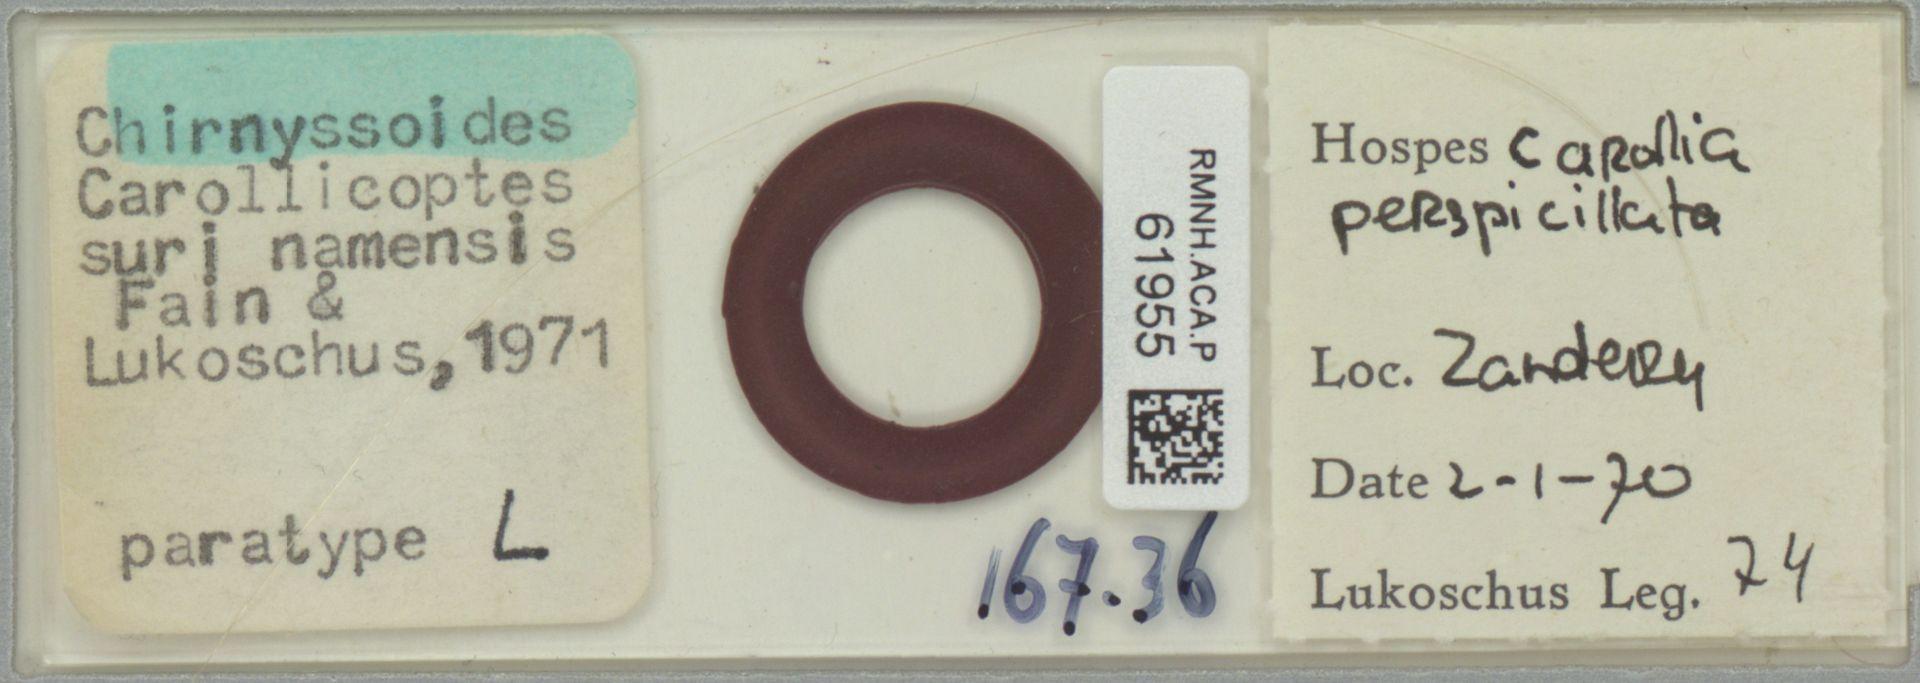 RMNH.ACA.P.61955 | Chirnyssoides carollicoptes surinamensis Fain & Lukoschus 1971